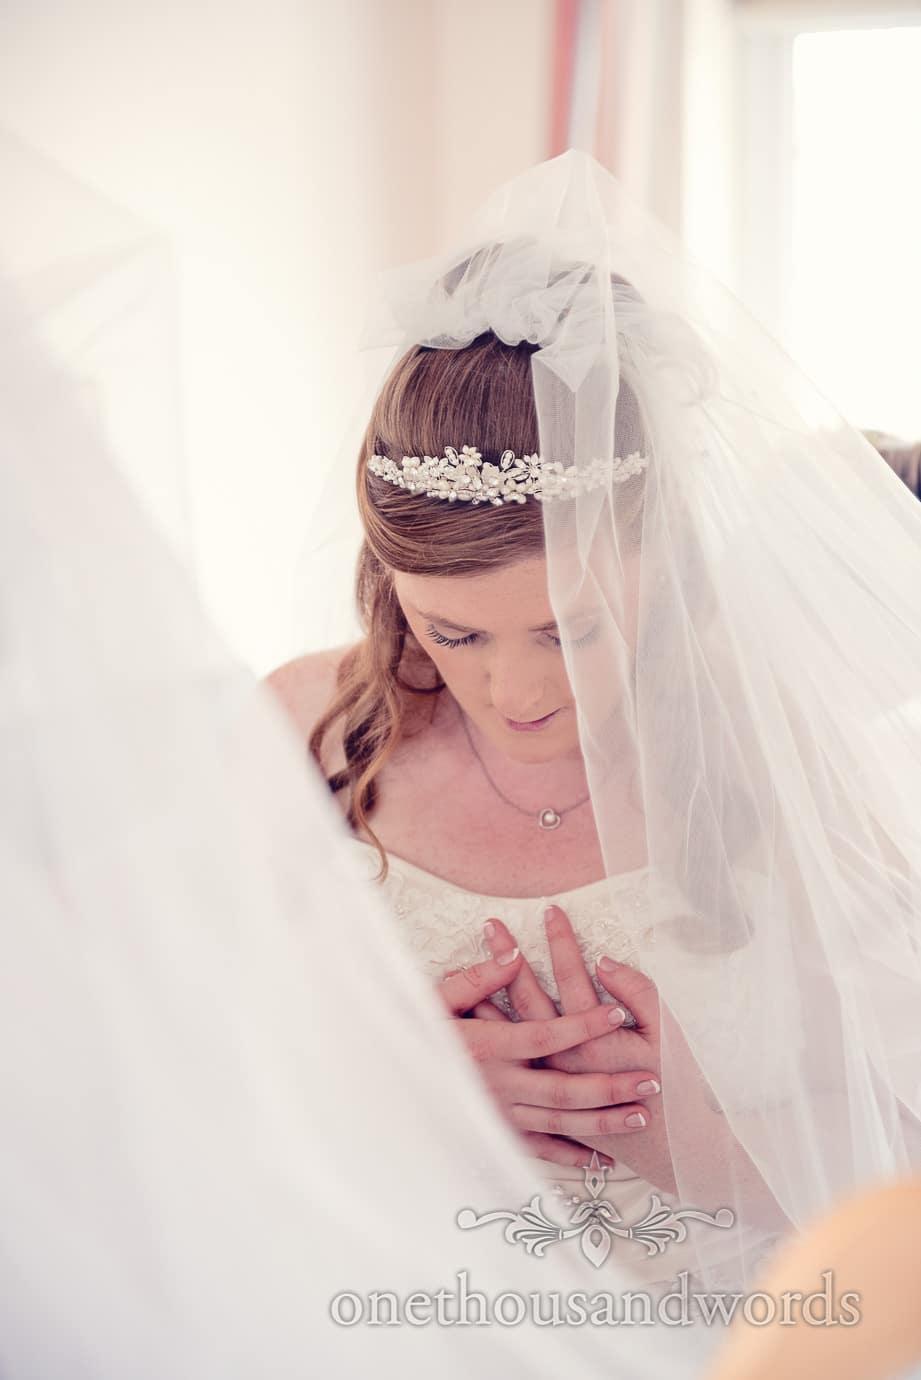 Bride in wedding tiara and veil portrait photograph on wedding morning